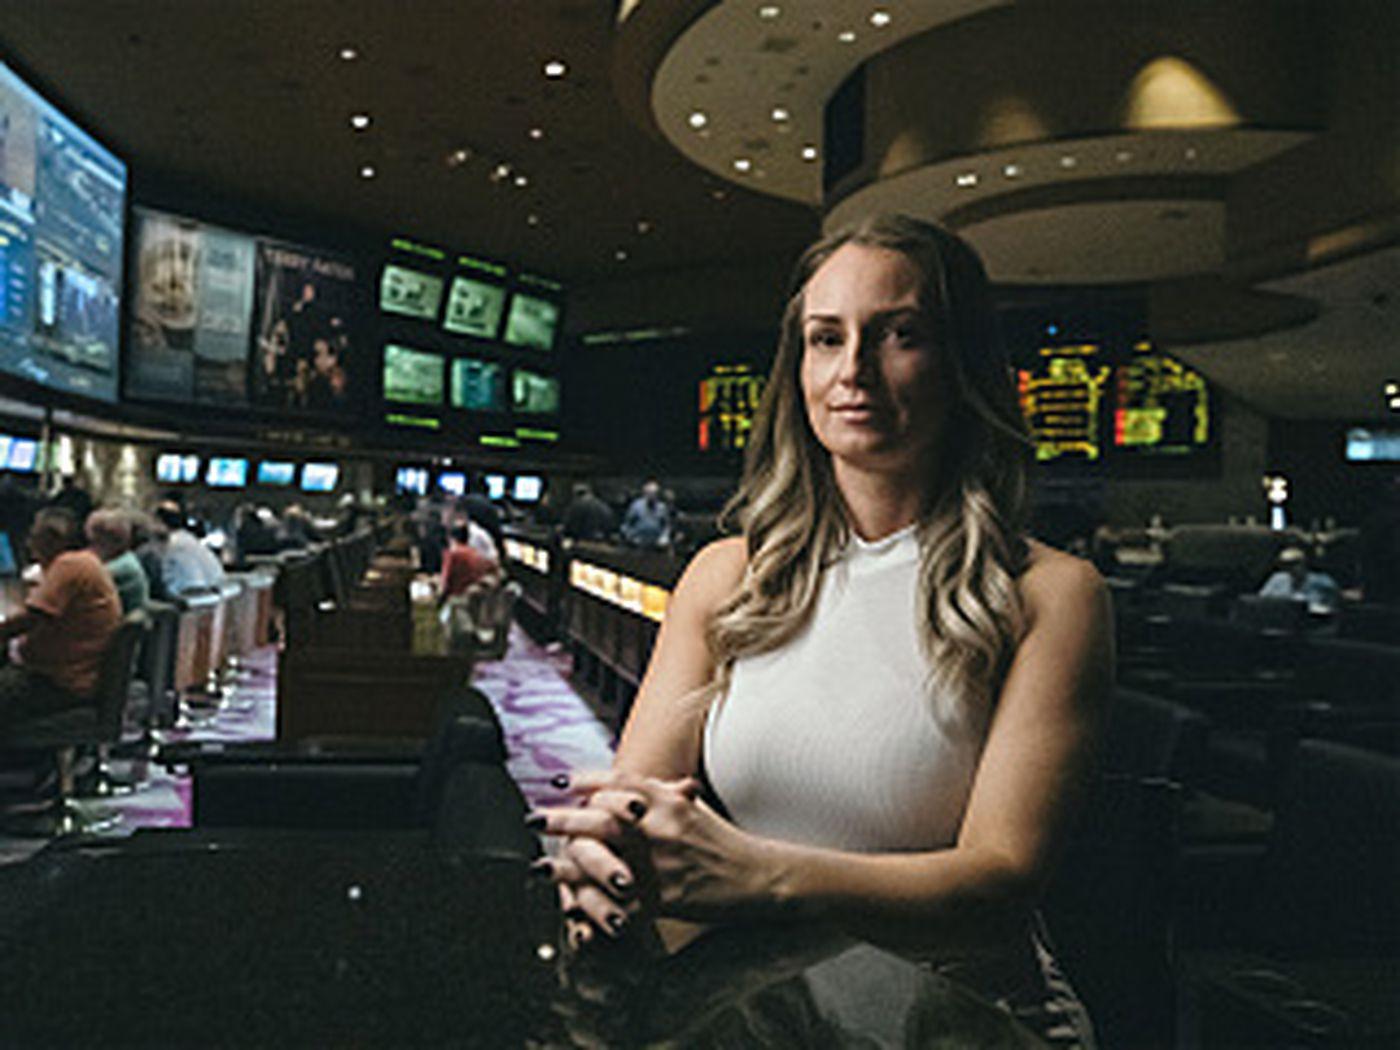 Showtime sports betting cedric mourier davydenko betting